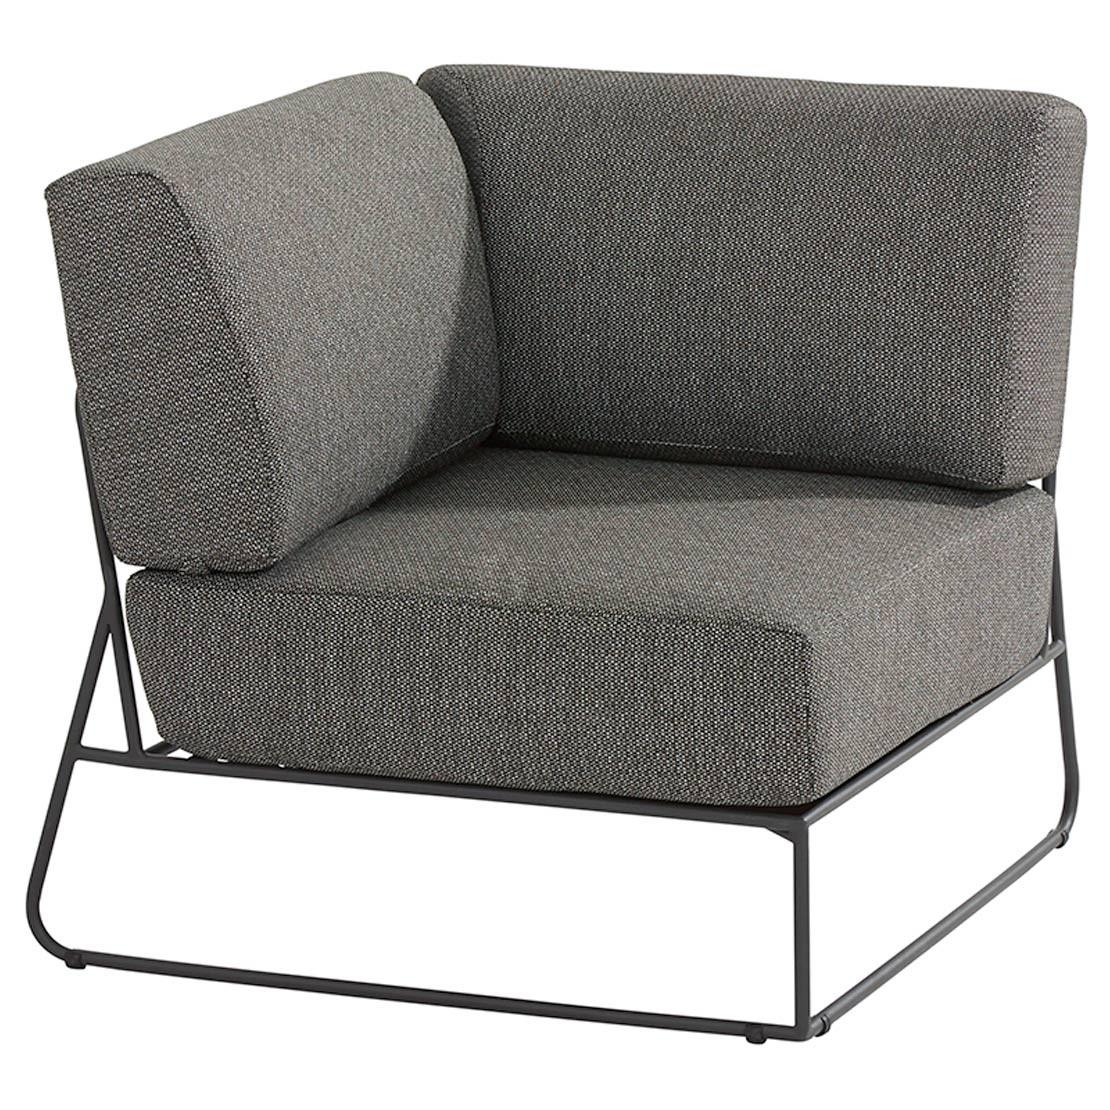 Coast modular corner with 3 cushions